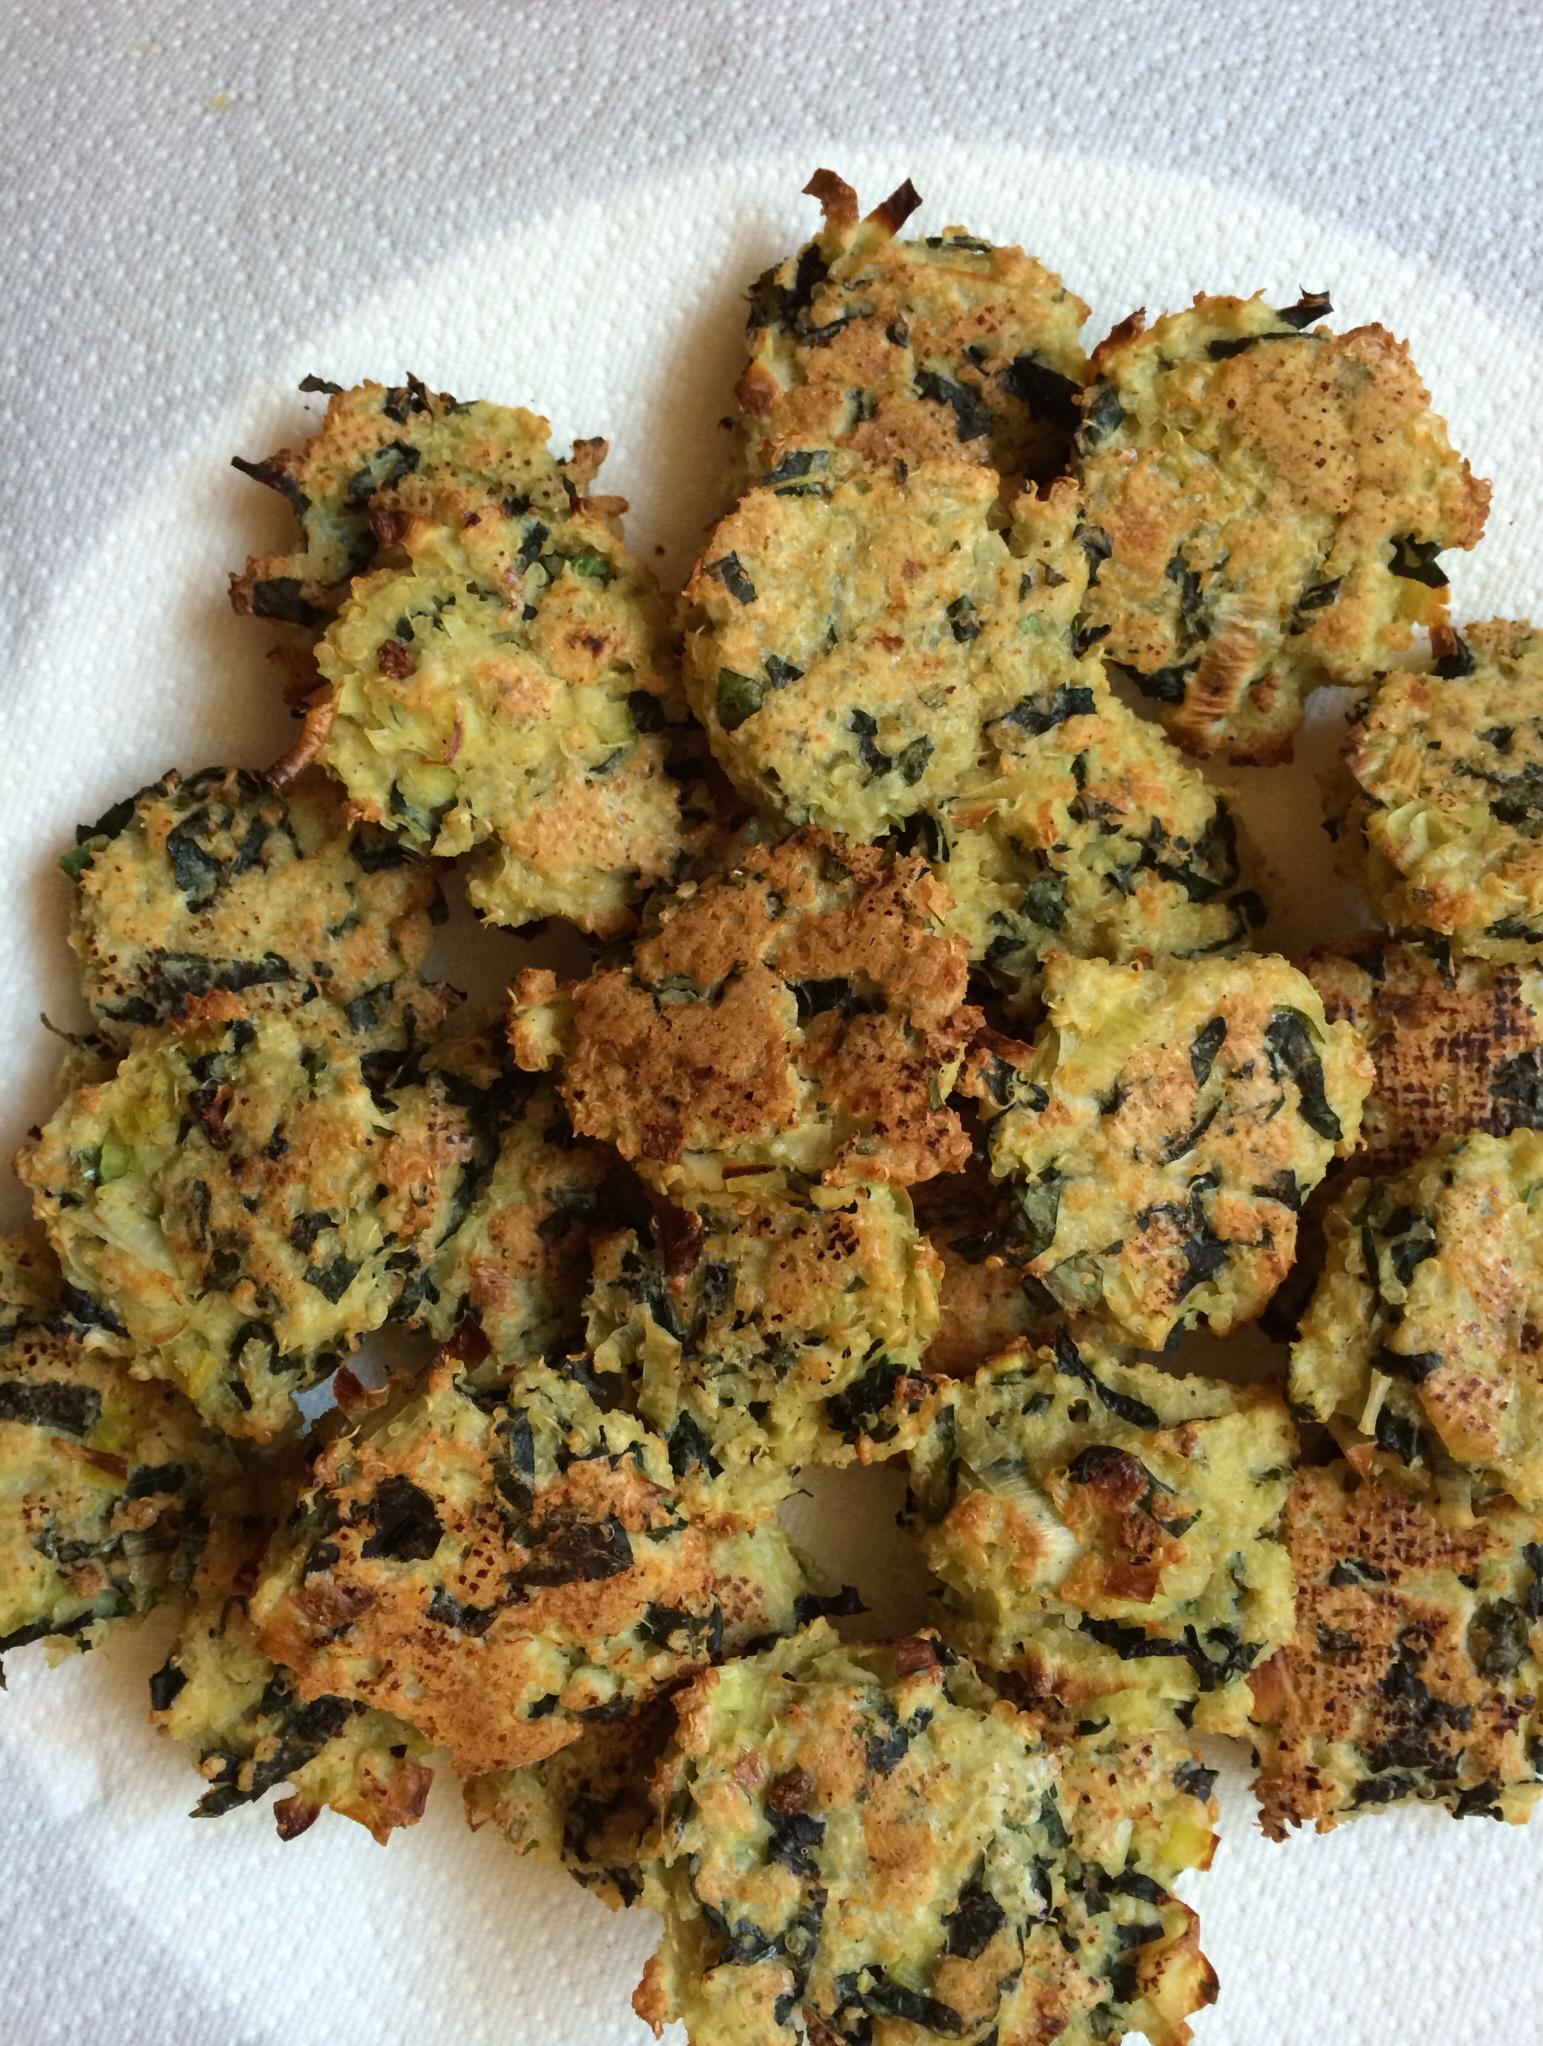 Baked Kale, Leek, and Quinoa Patties